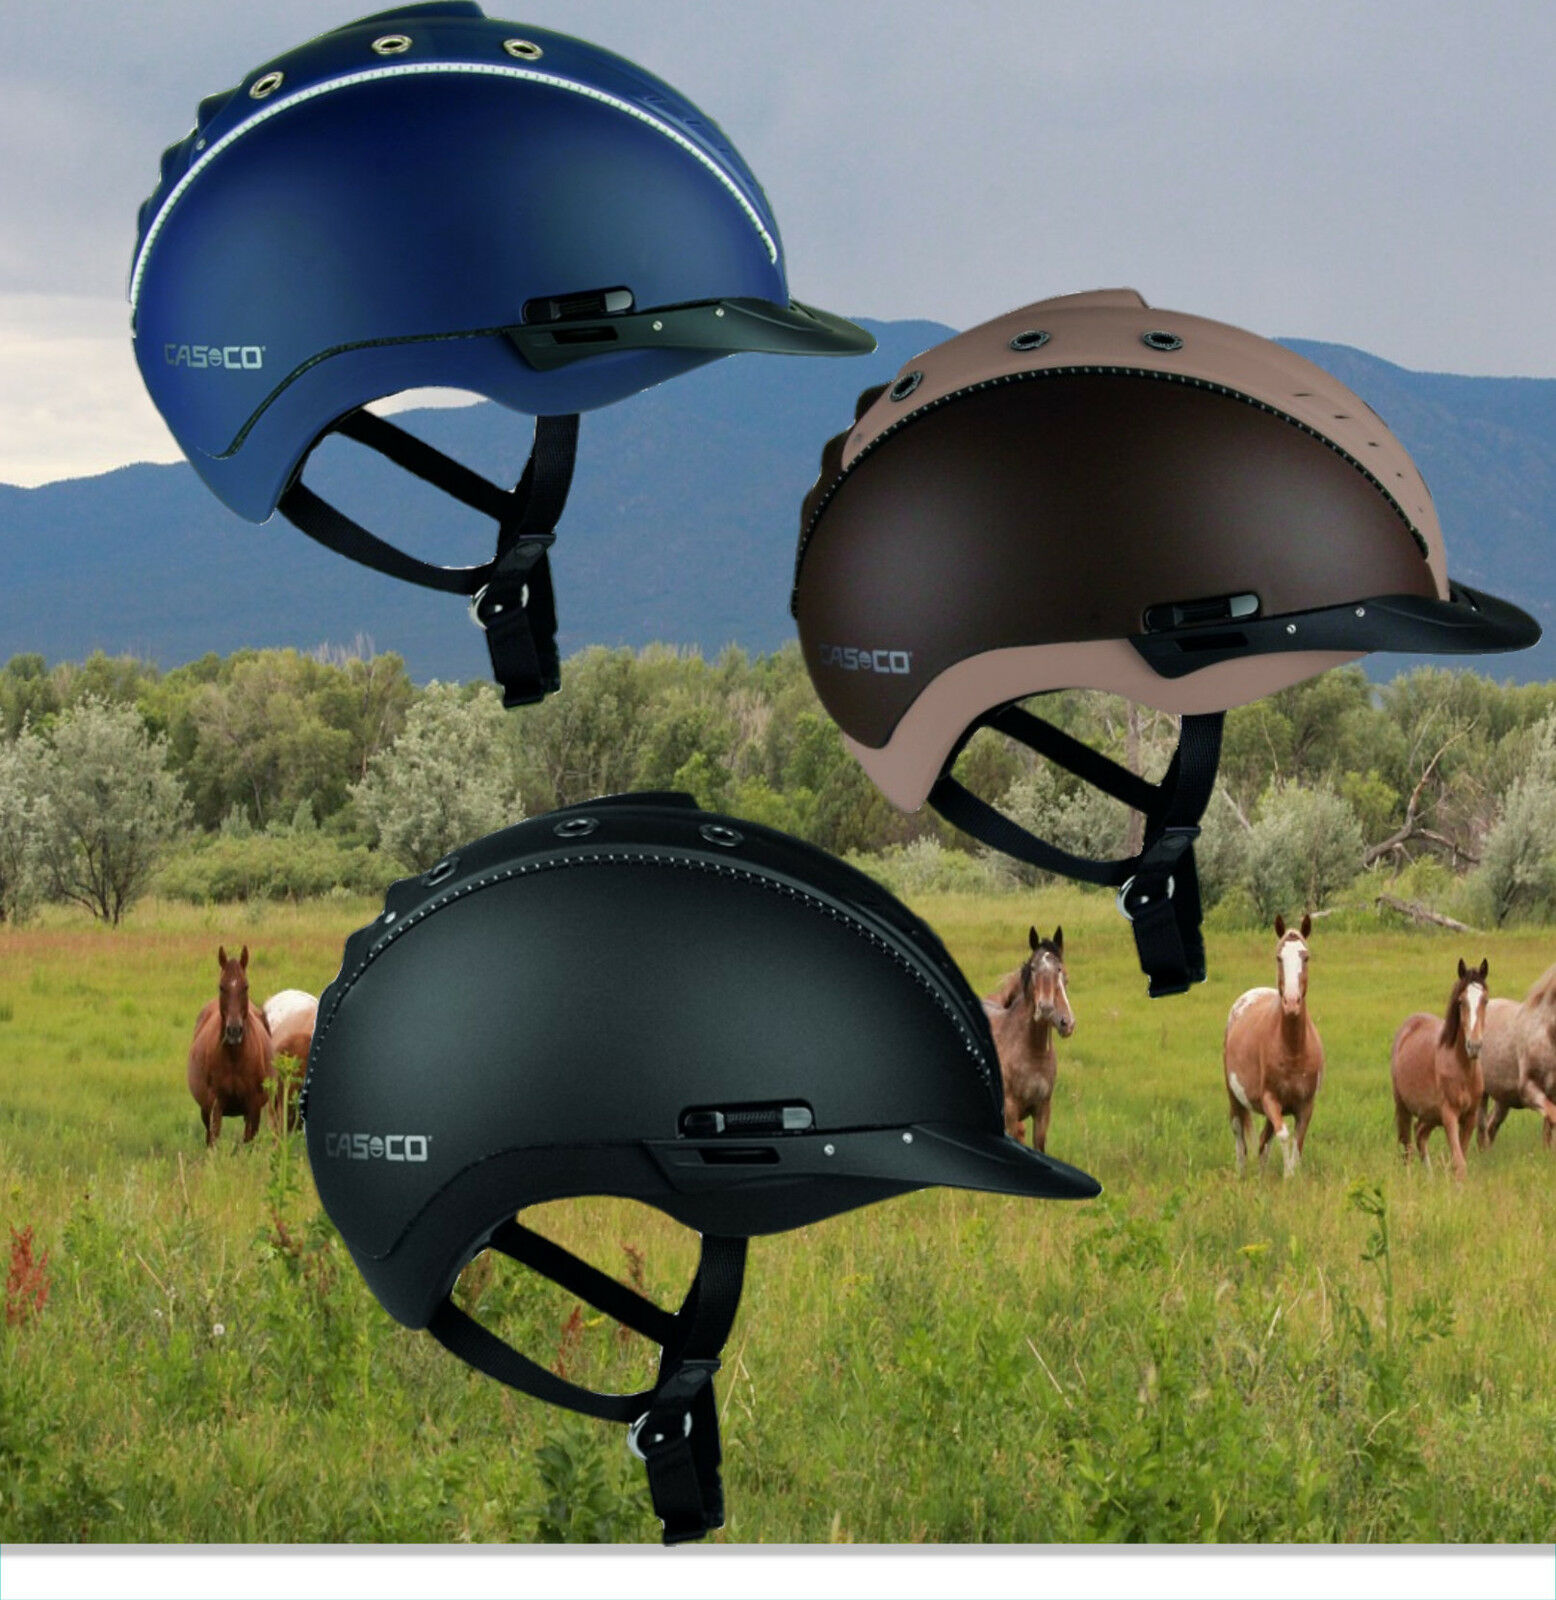 Casco Riding Helmet Mistrall 2 Navy, Casco Riding Cap Mistrall 2 Blau, New Standard